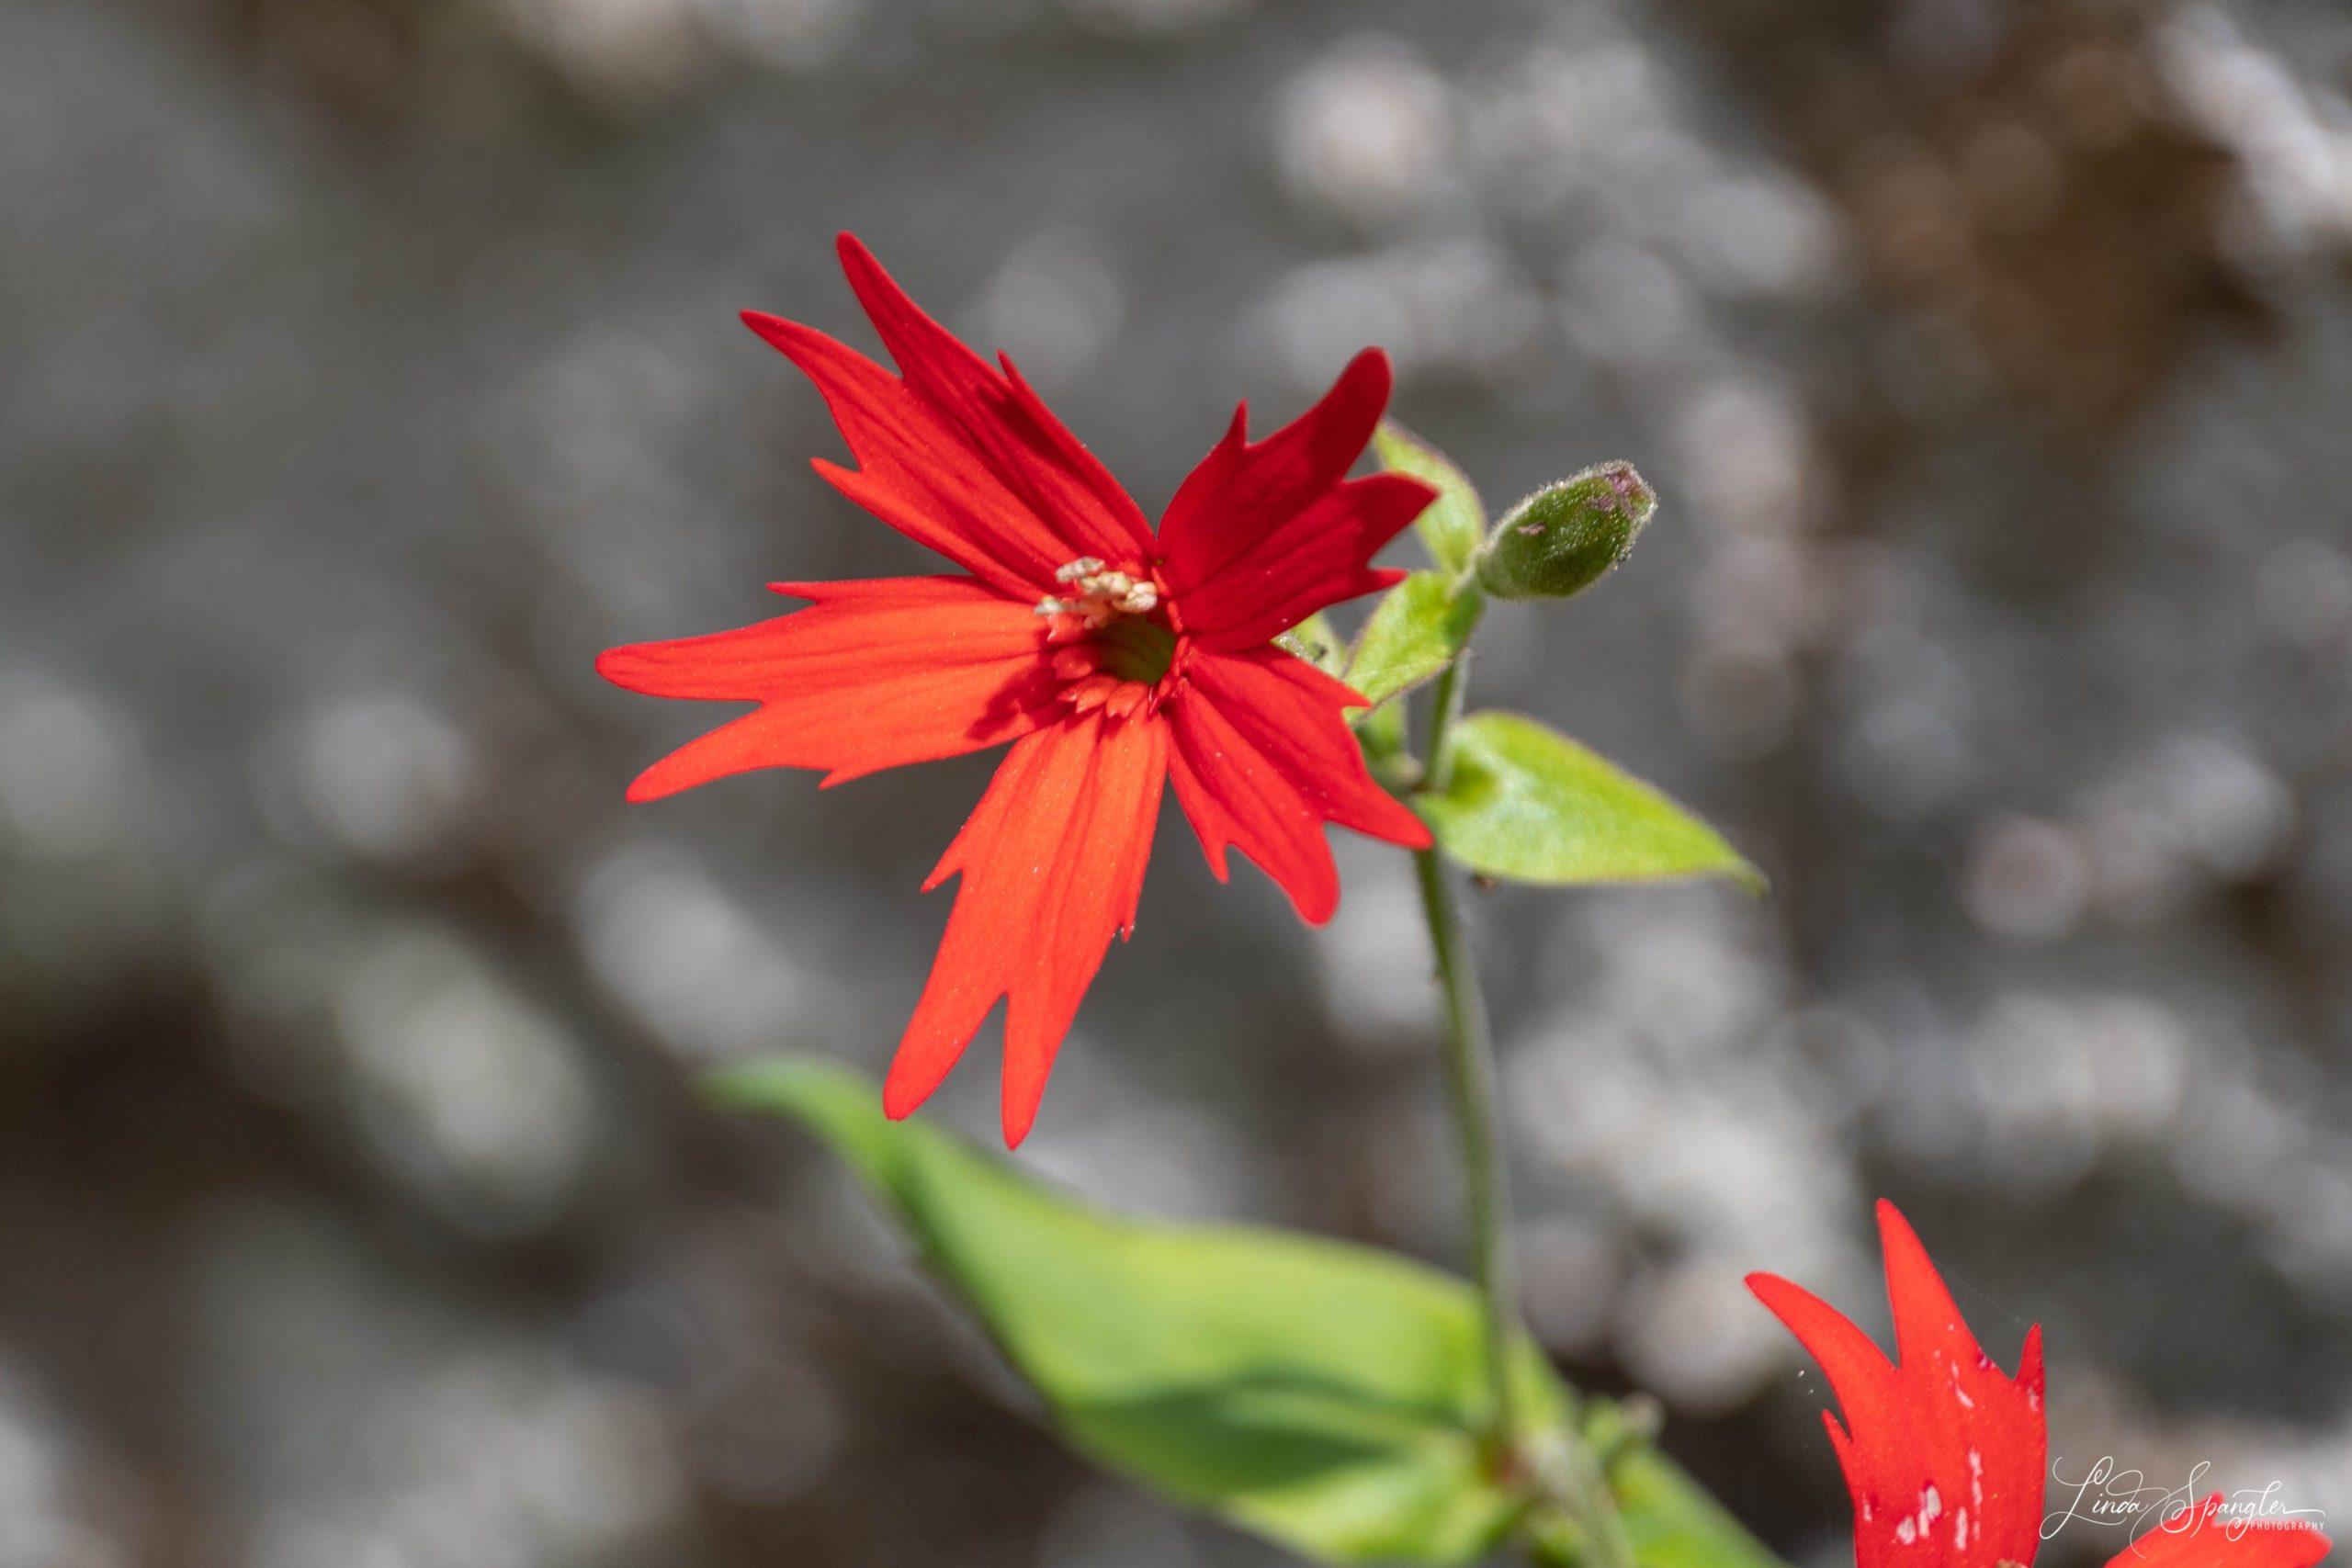 GSMNP wildflower - photo by Linda Spangler